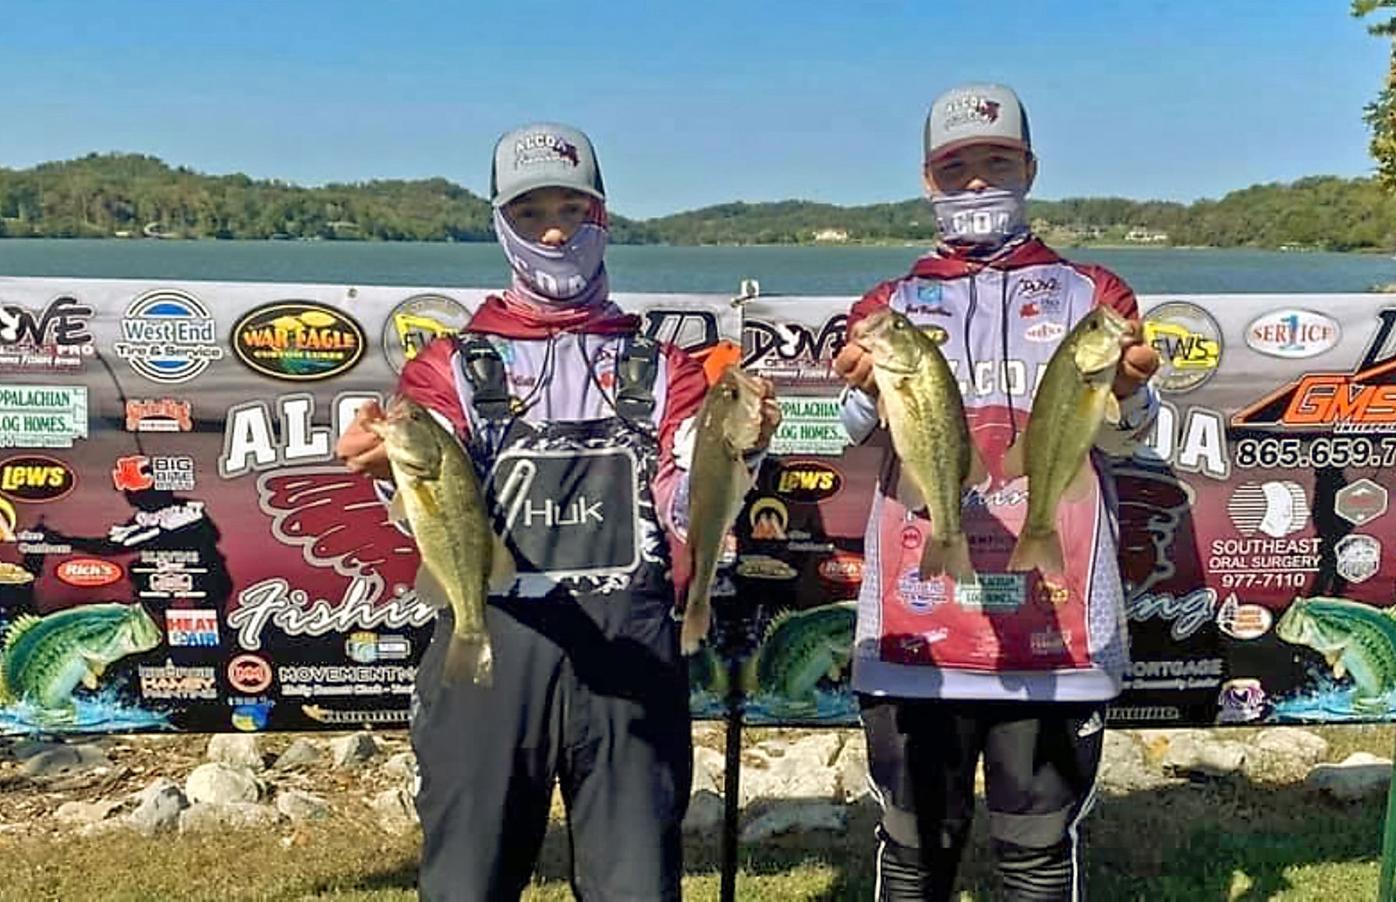 Alcoa Fishing Team members Pierce Tollett and Joe Vaulton